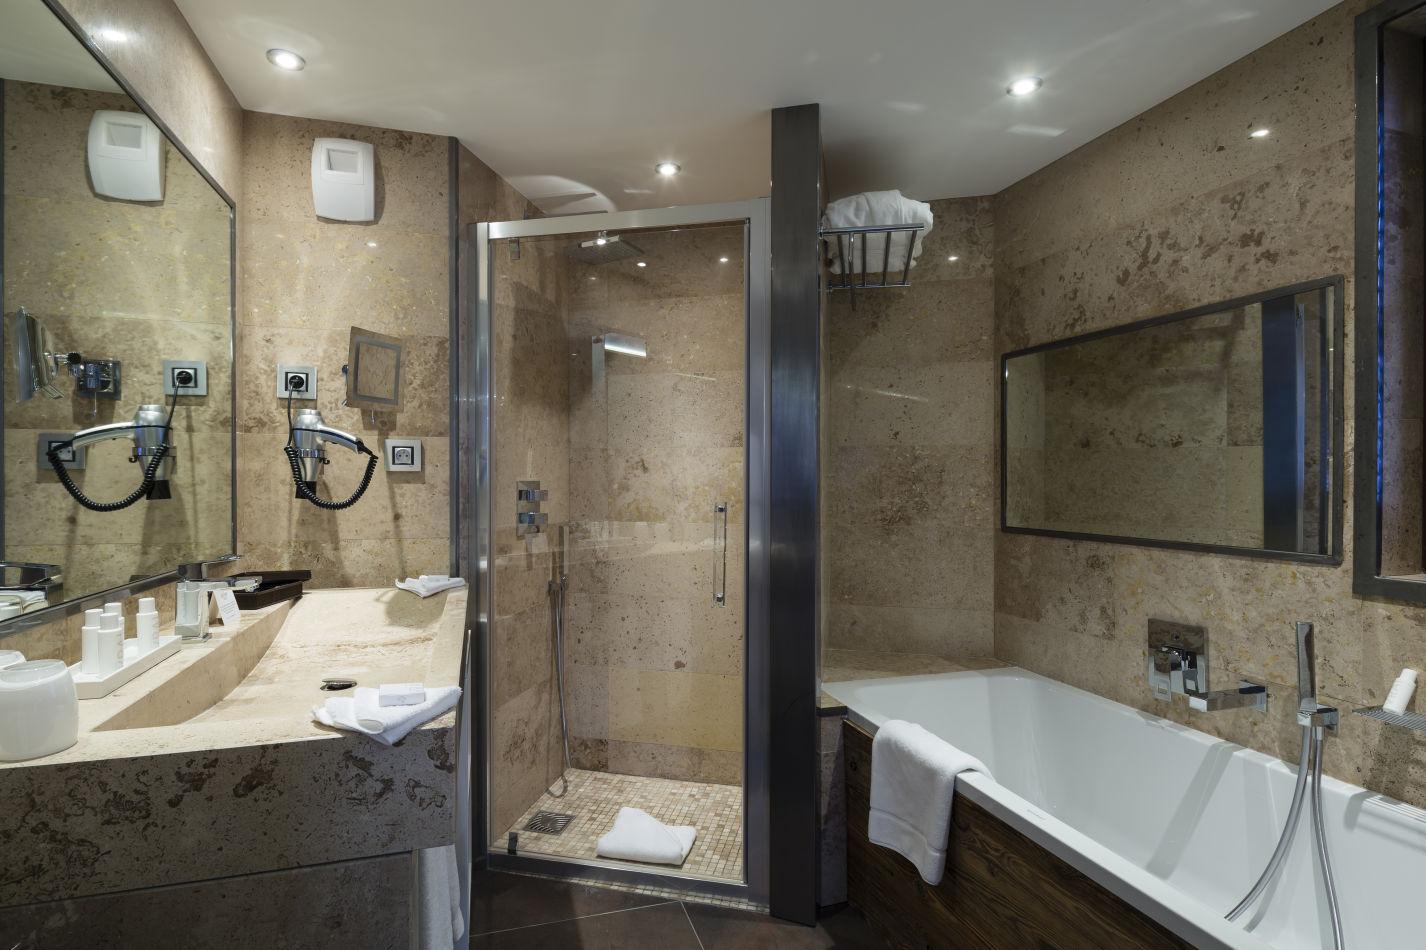 luxury-room-36-m%c2%b2-salle-de-bain